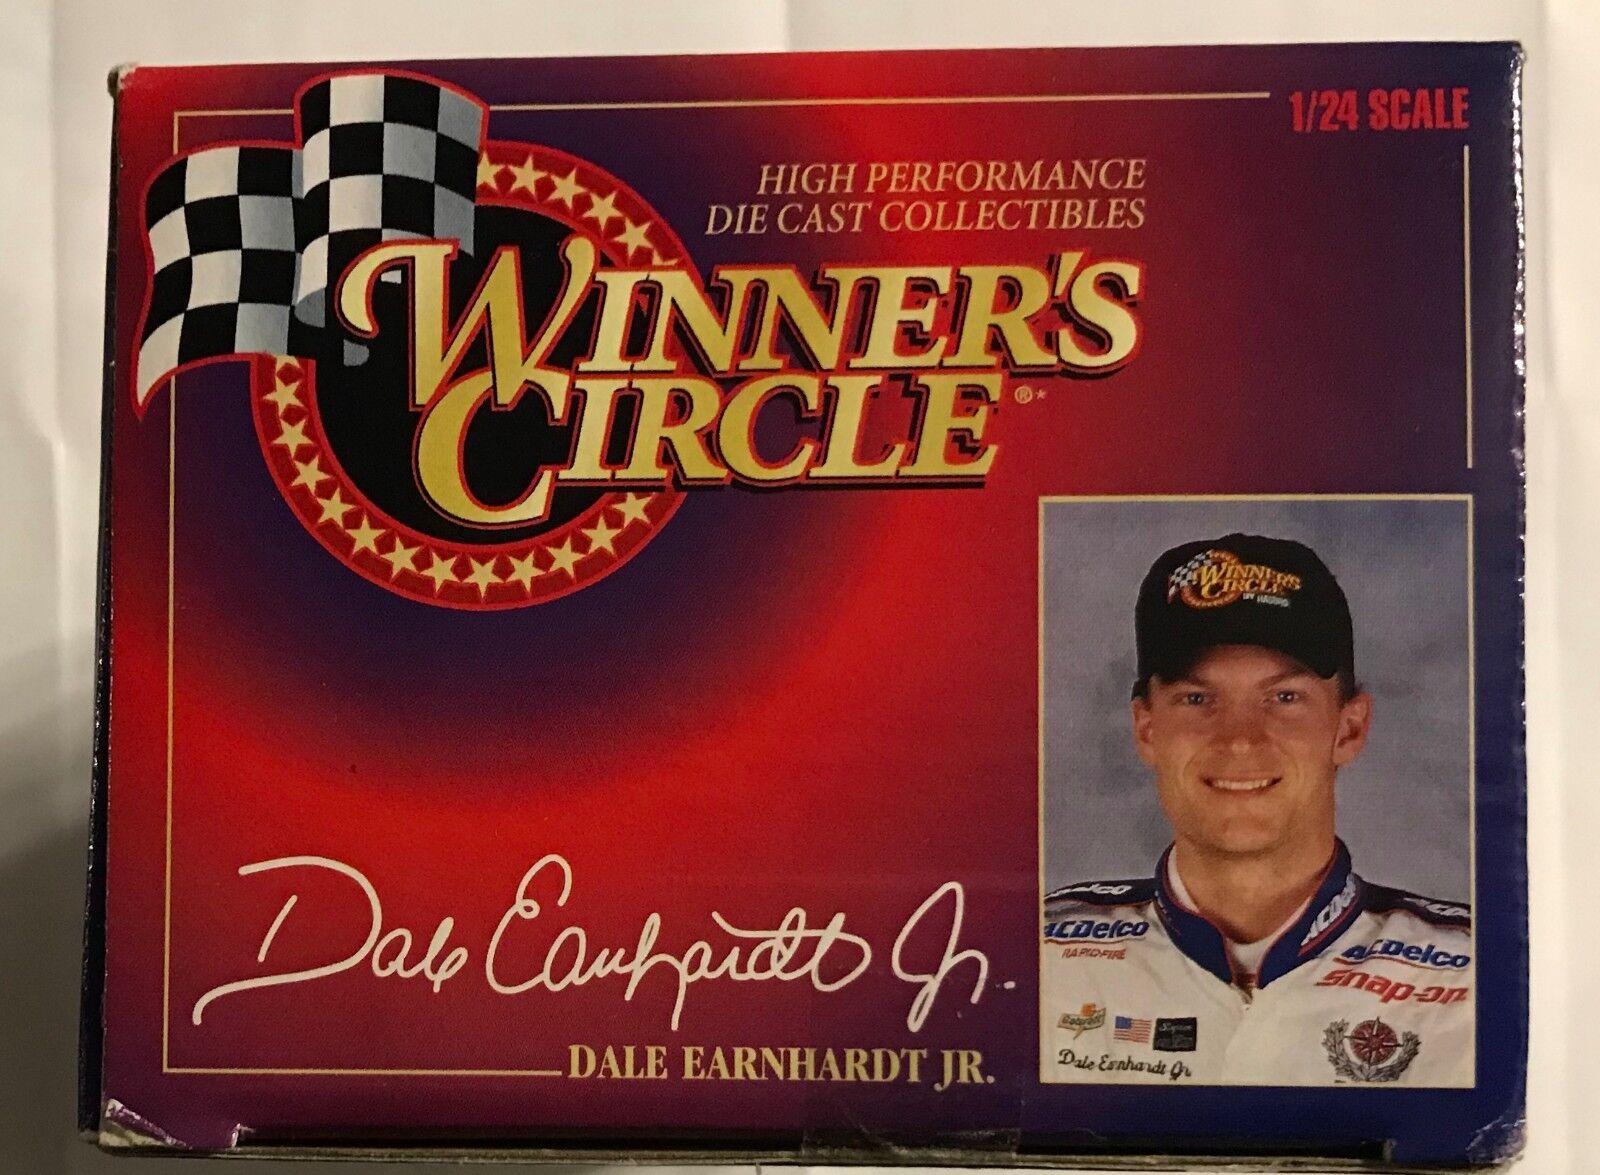 1998 WINNER'S CIRCLE   3 DALE EARNHARDT,JR. - ACDelco - 1 24TH     3088